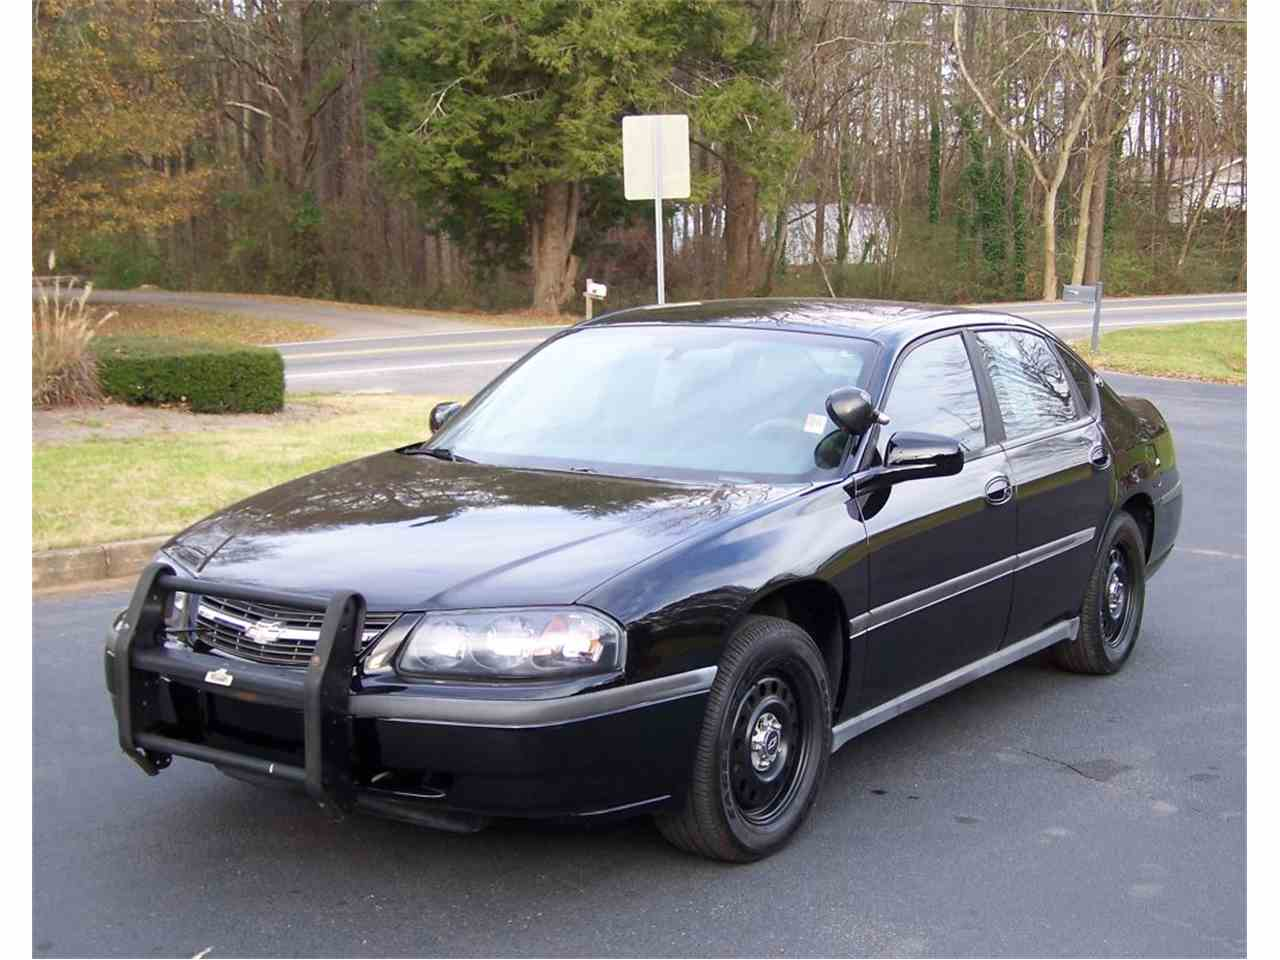 2005 chevrolet impala police 9c1 for sale cc 752208. Black Bedroom Furniture Sets. Home Design Ideas